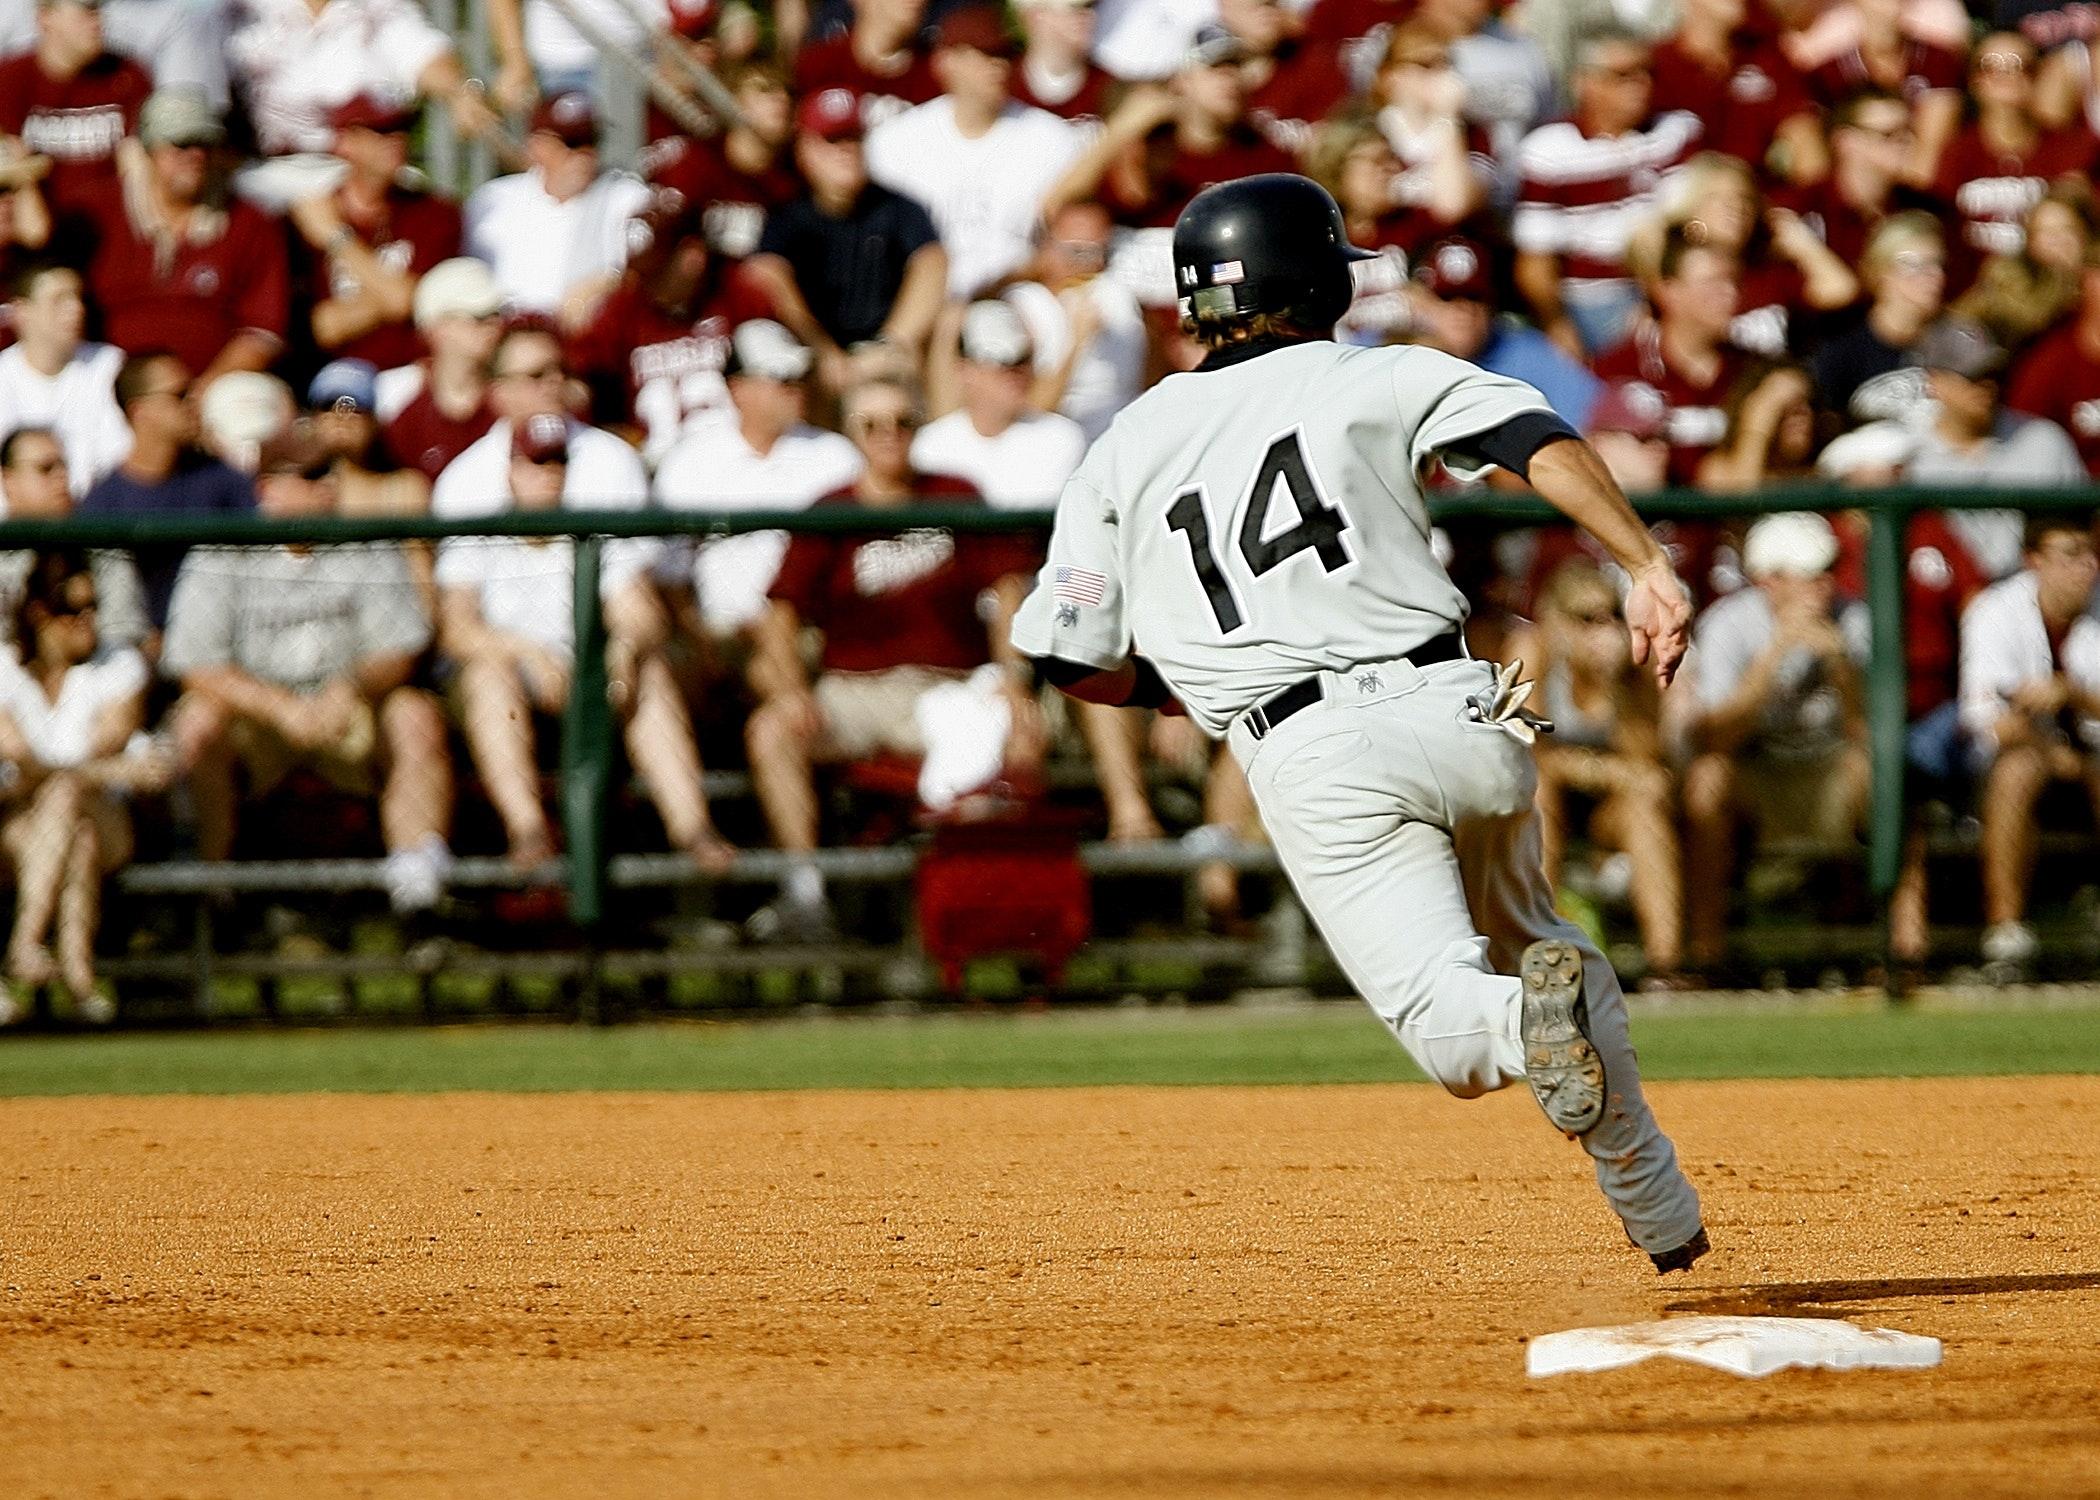 Baseball Player Wearing Blue And White Jersey Catching